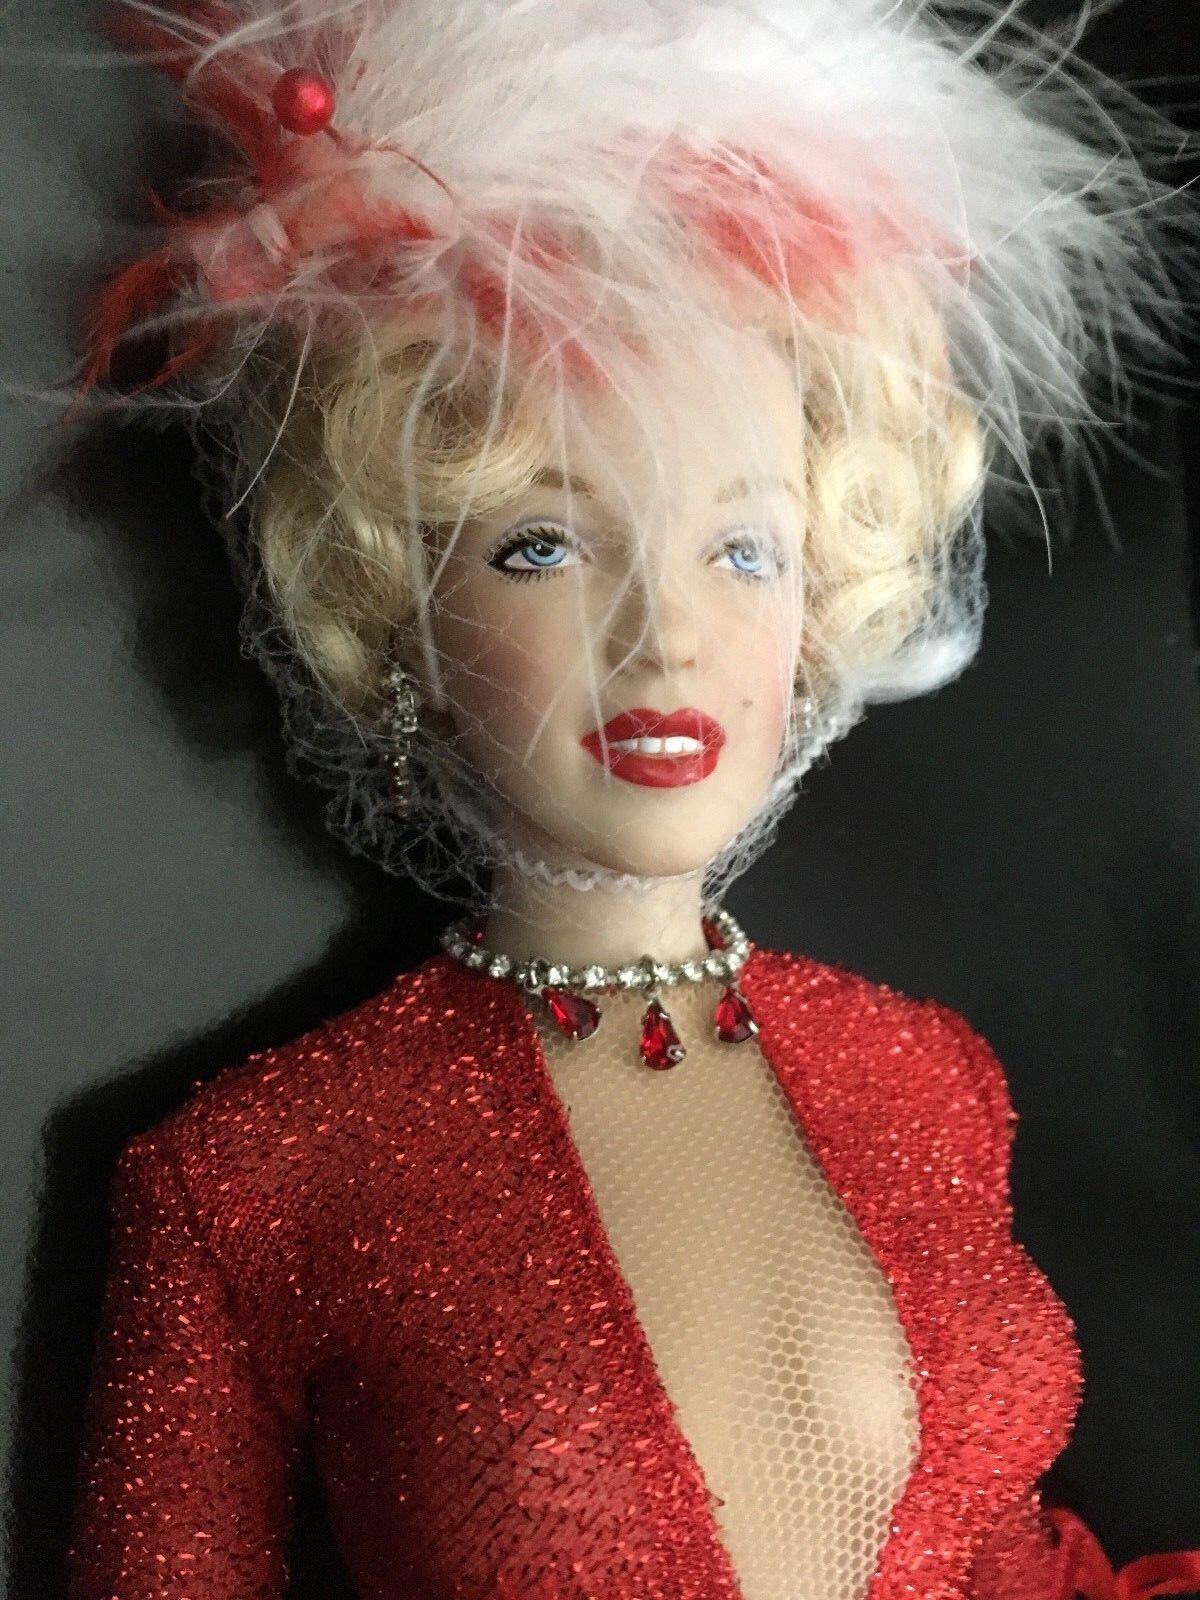 Franklin Mint Marilyn Monroe 16  Vinilo Muñeca Caballeros prefieren rubias Conjunto Nuevo En Caja